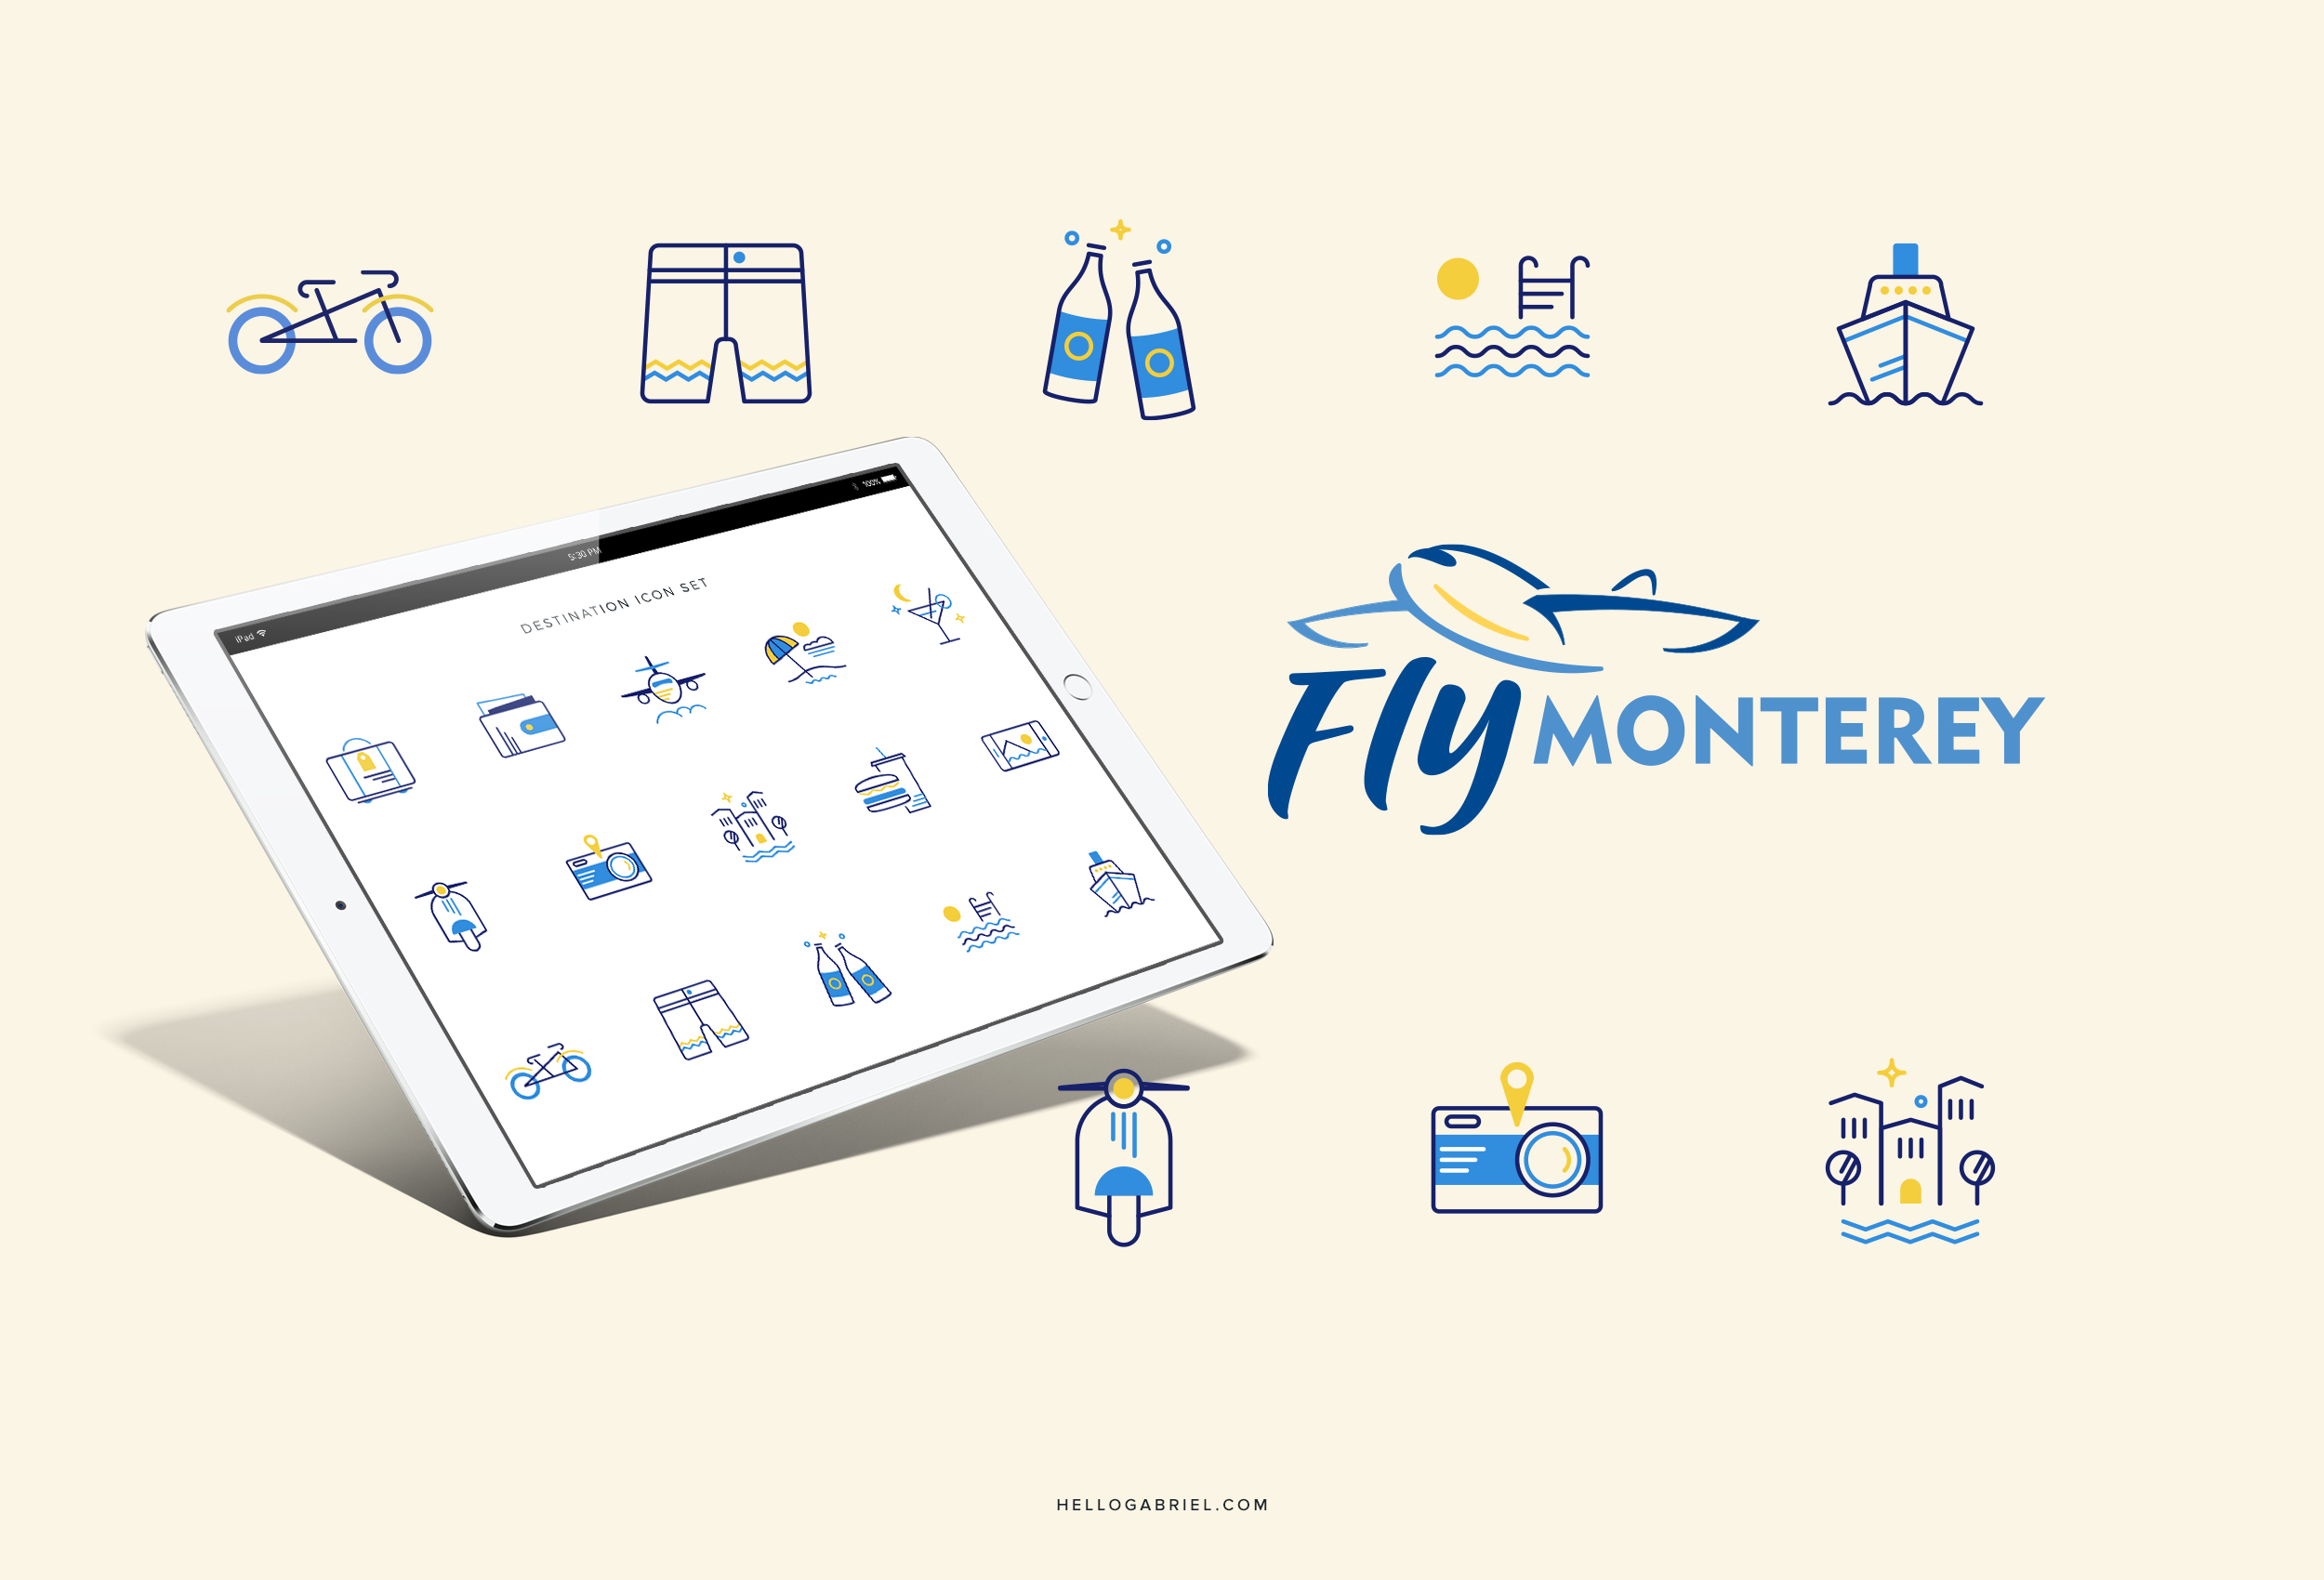 flymonterey1.jpg